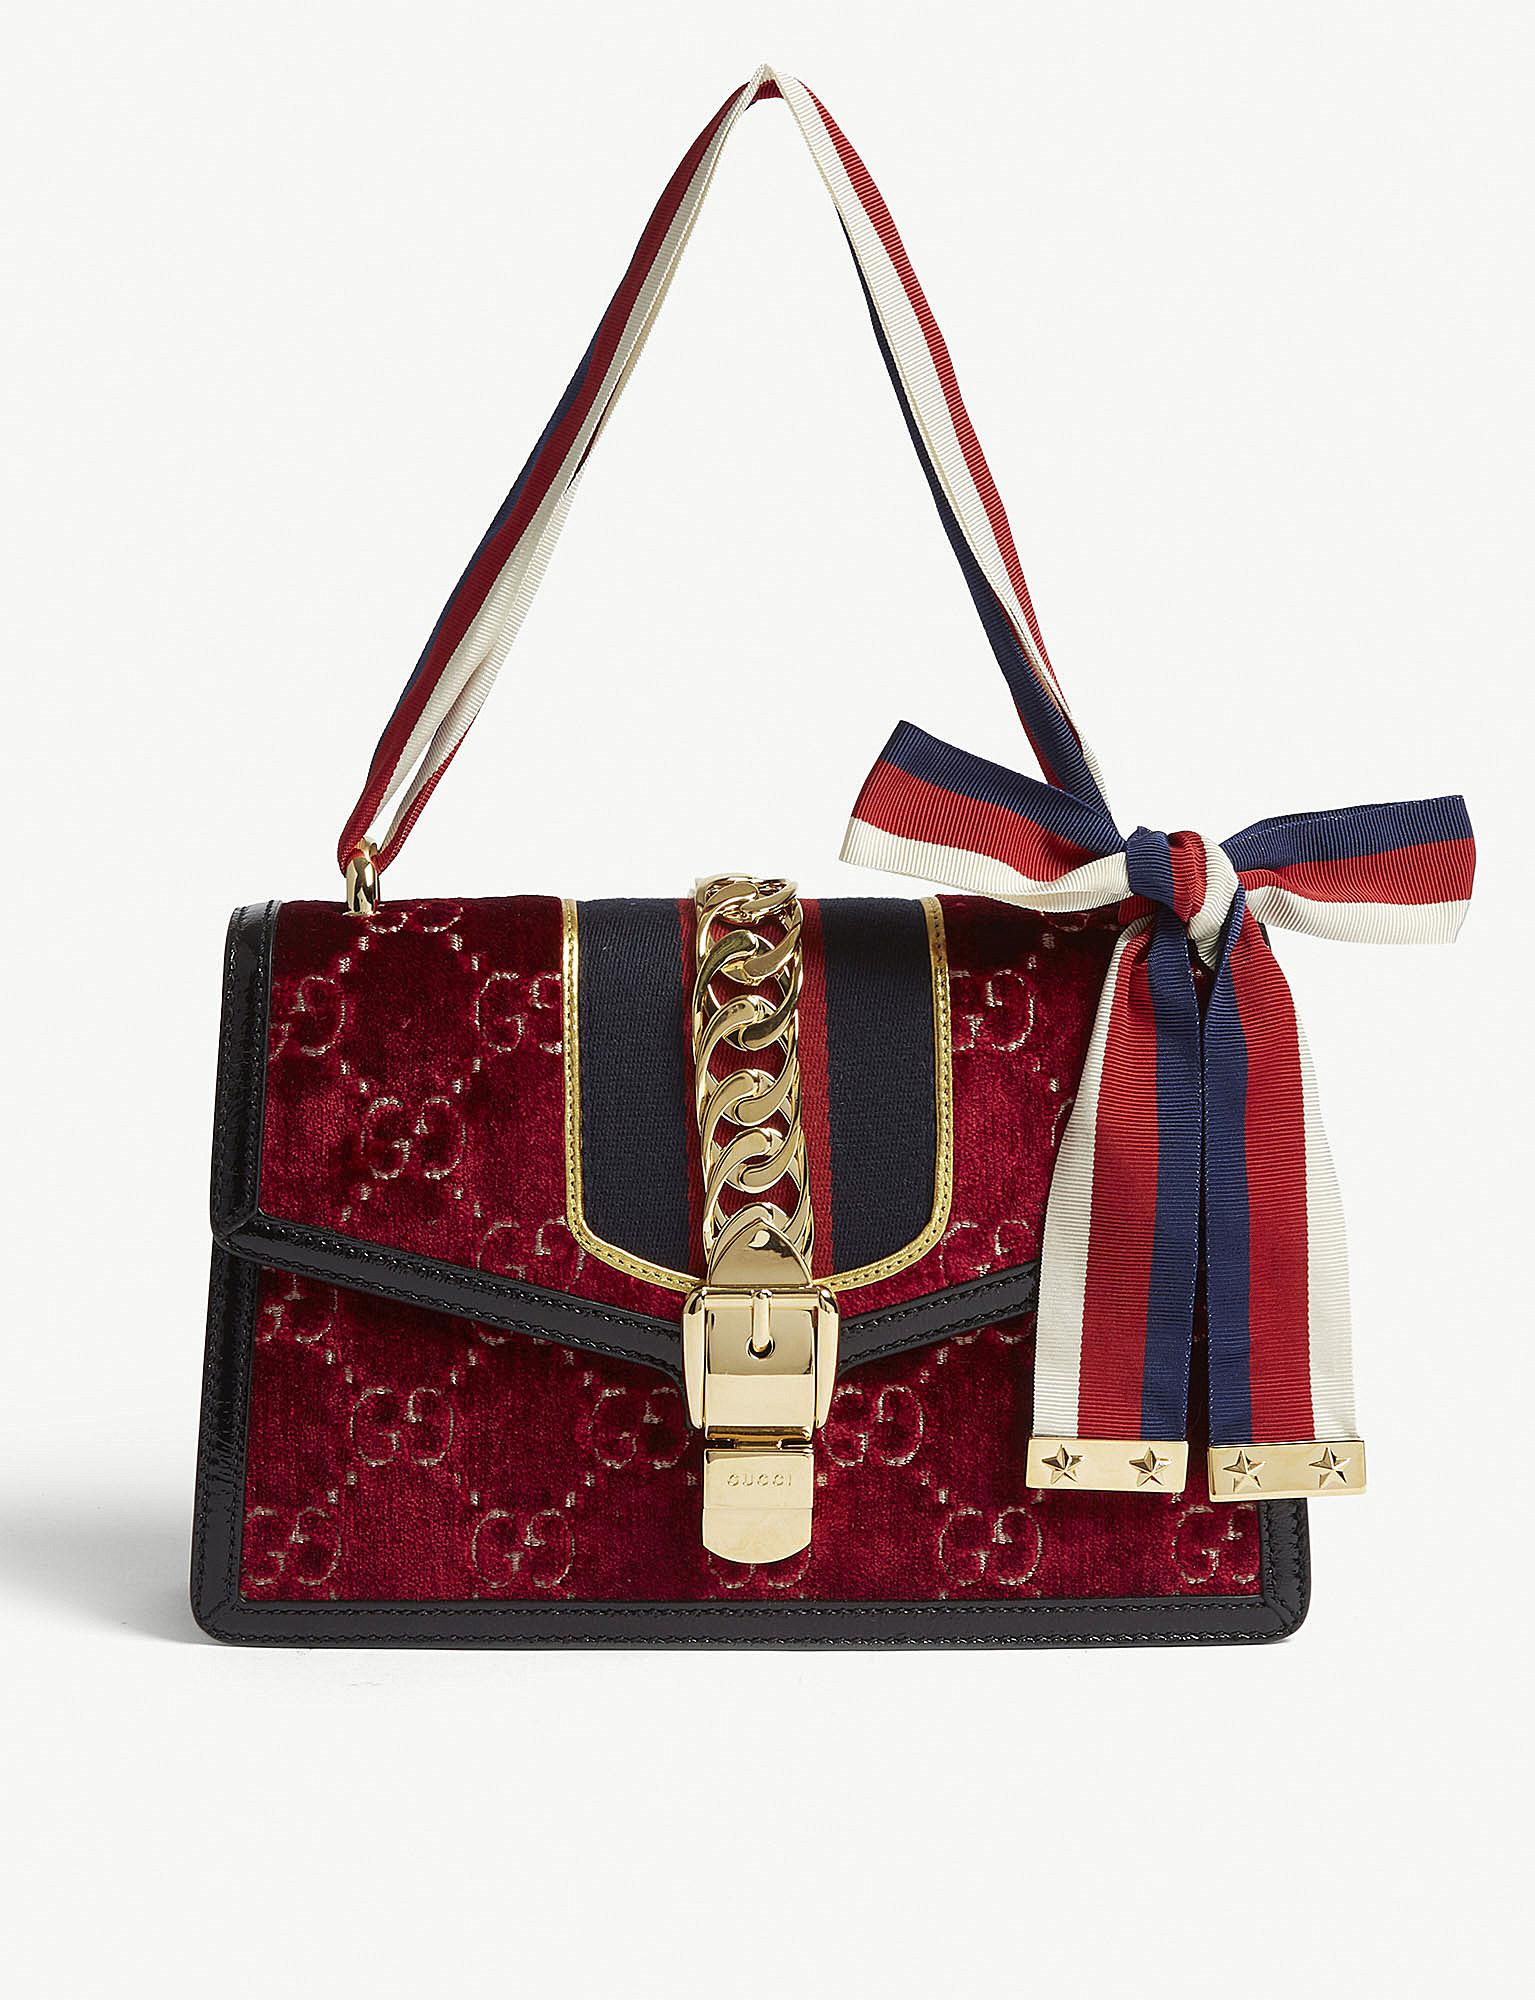 4eb01923bbe728 Gucci Red Sylvie Embossed Velvet Shoulder Bag in Red - Lyst